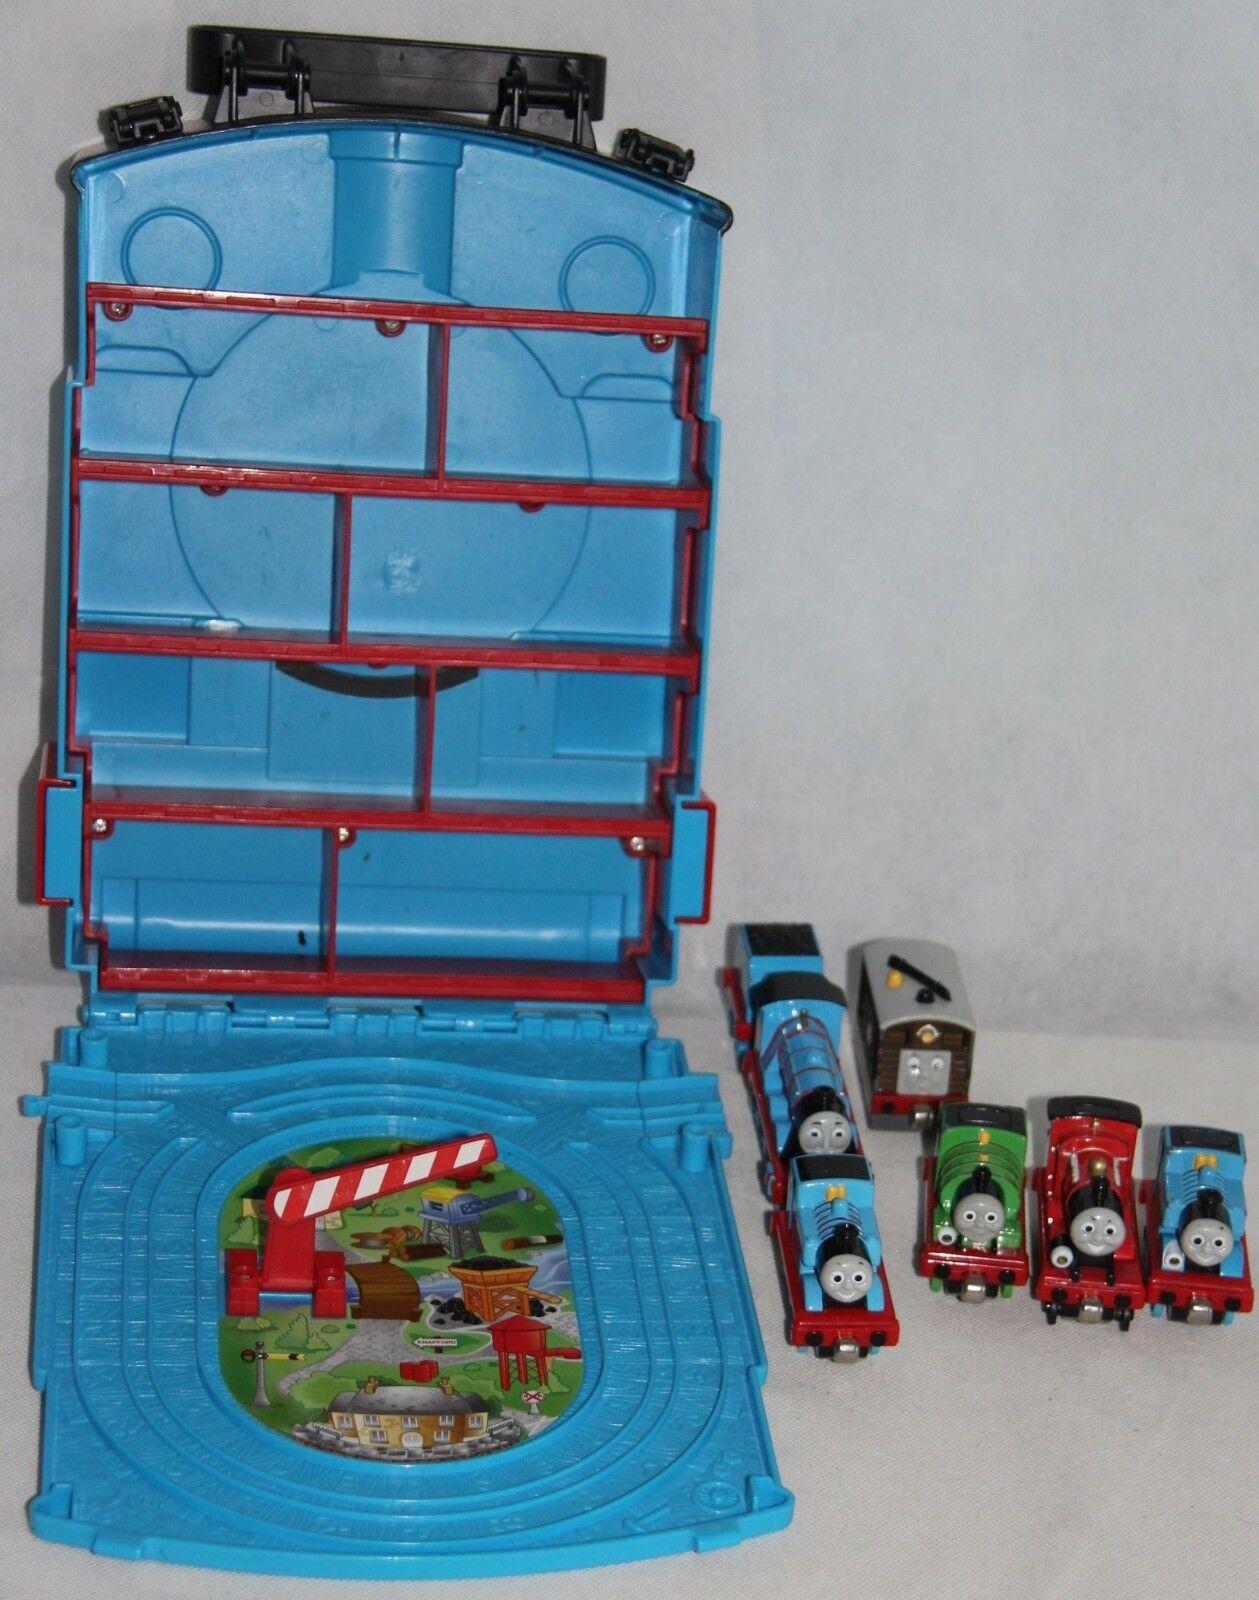 Thomas und seine Freunde Transportkoffer Lok Koffer Bahn 7 Loks Take-N-Play-Alo